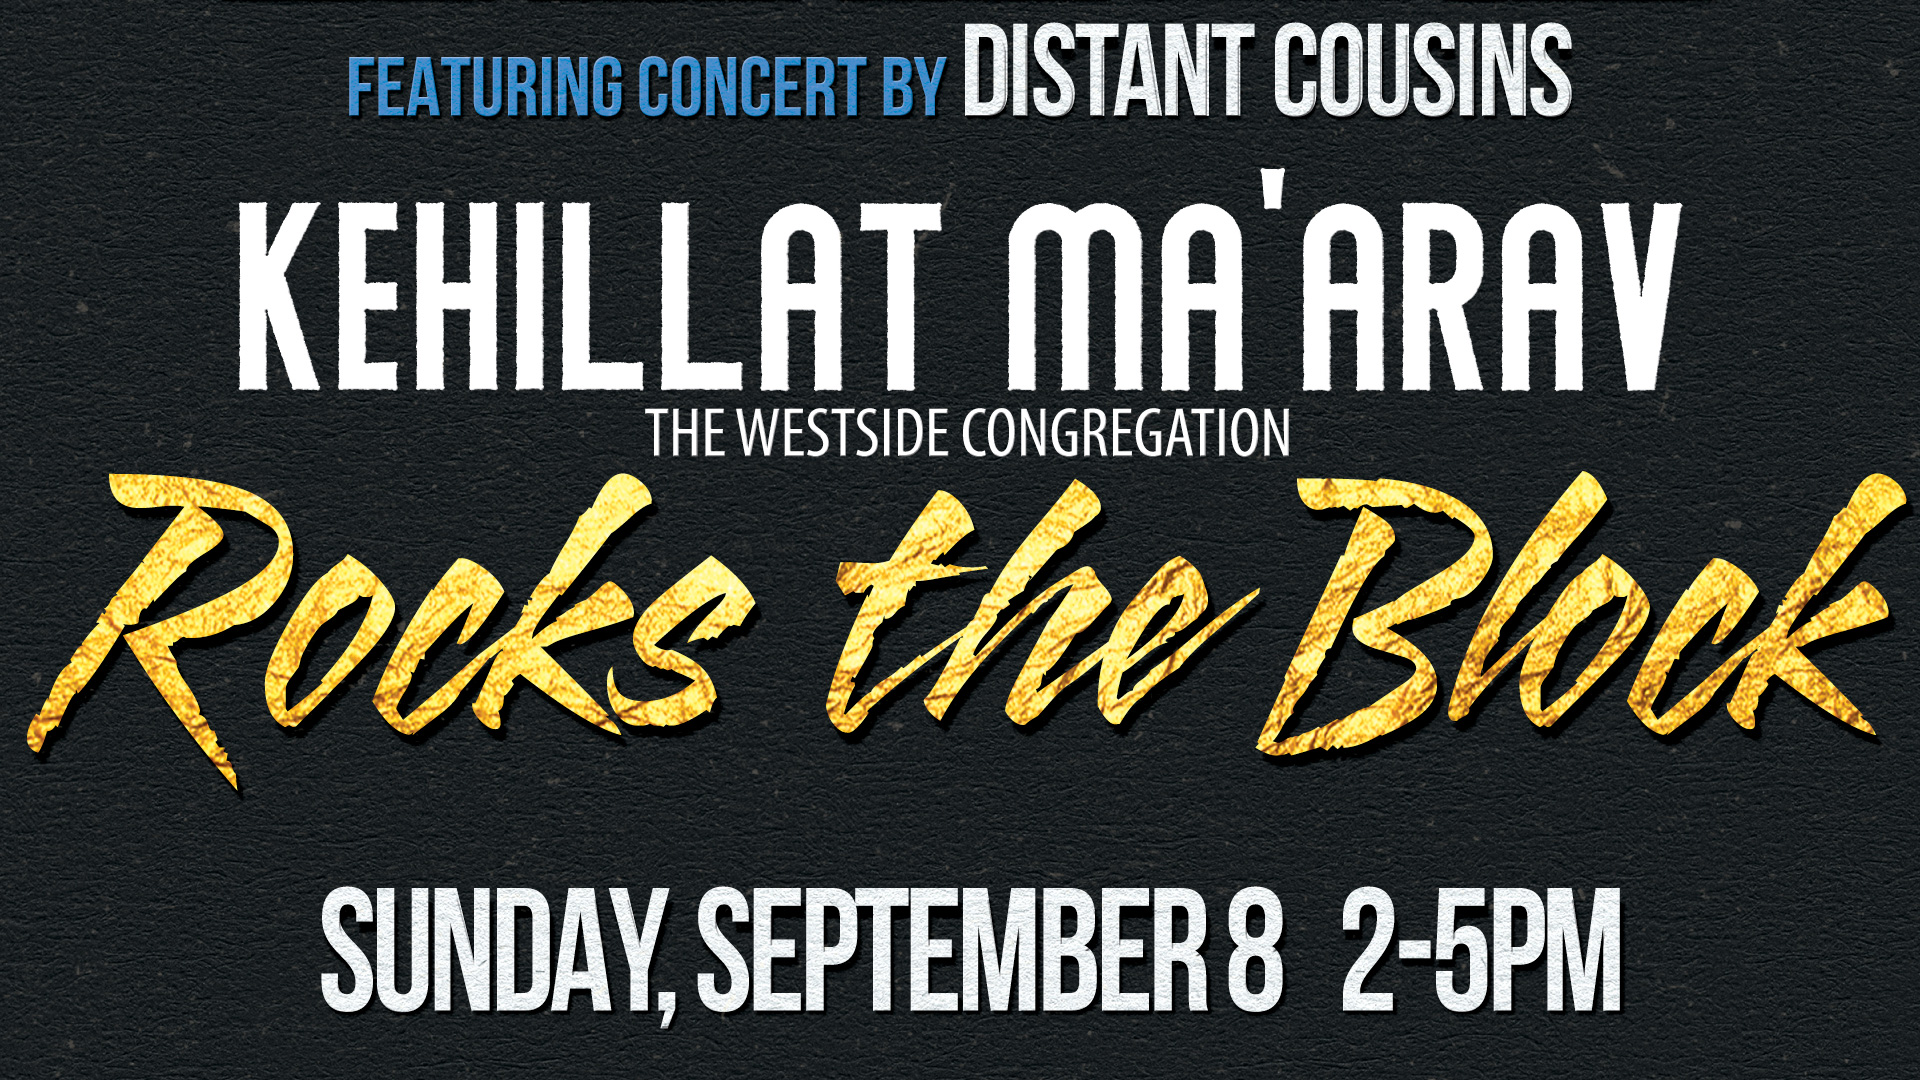 KM Rocks the Block